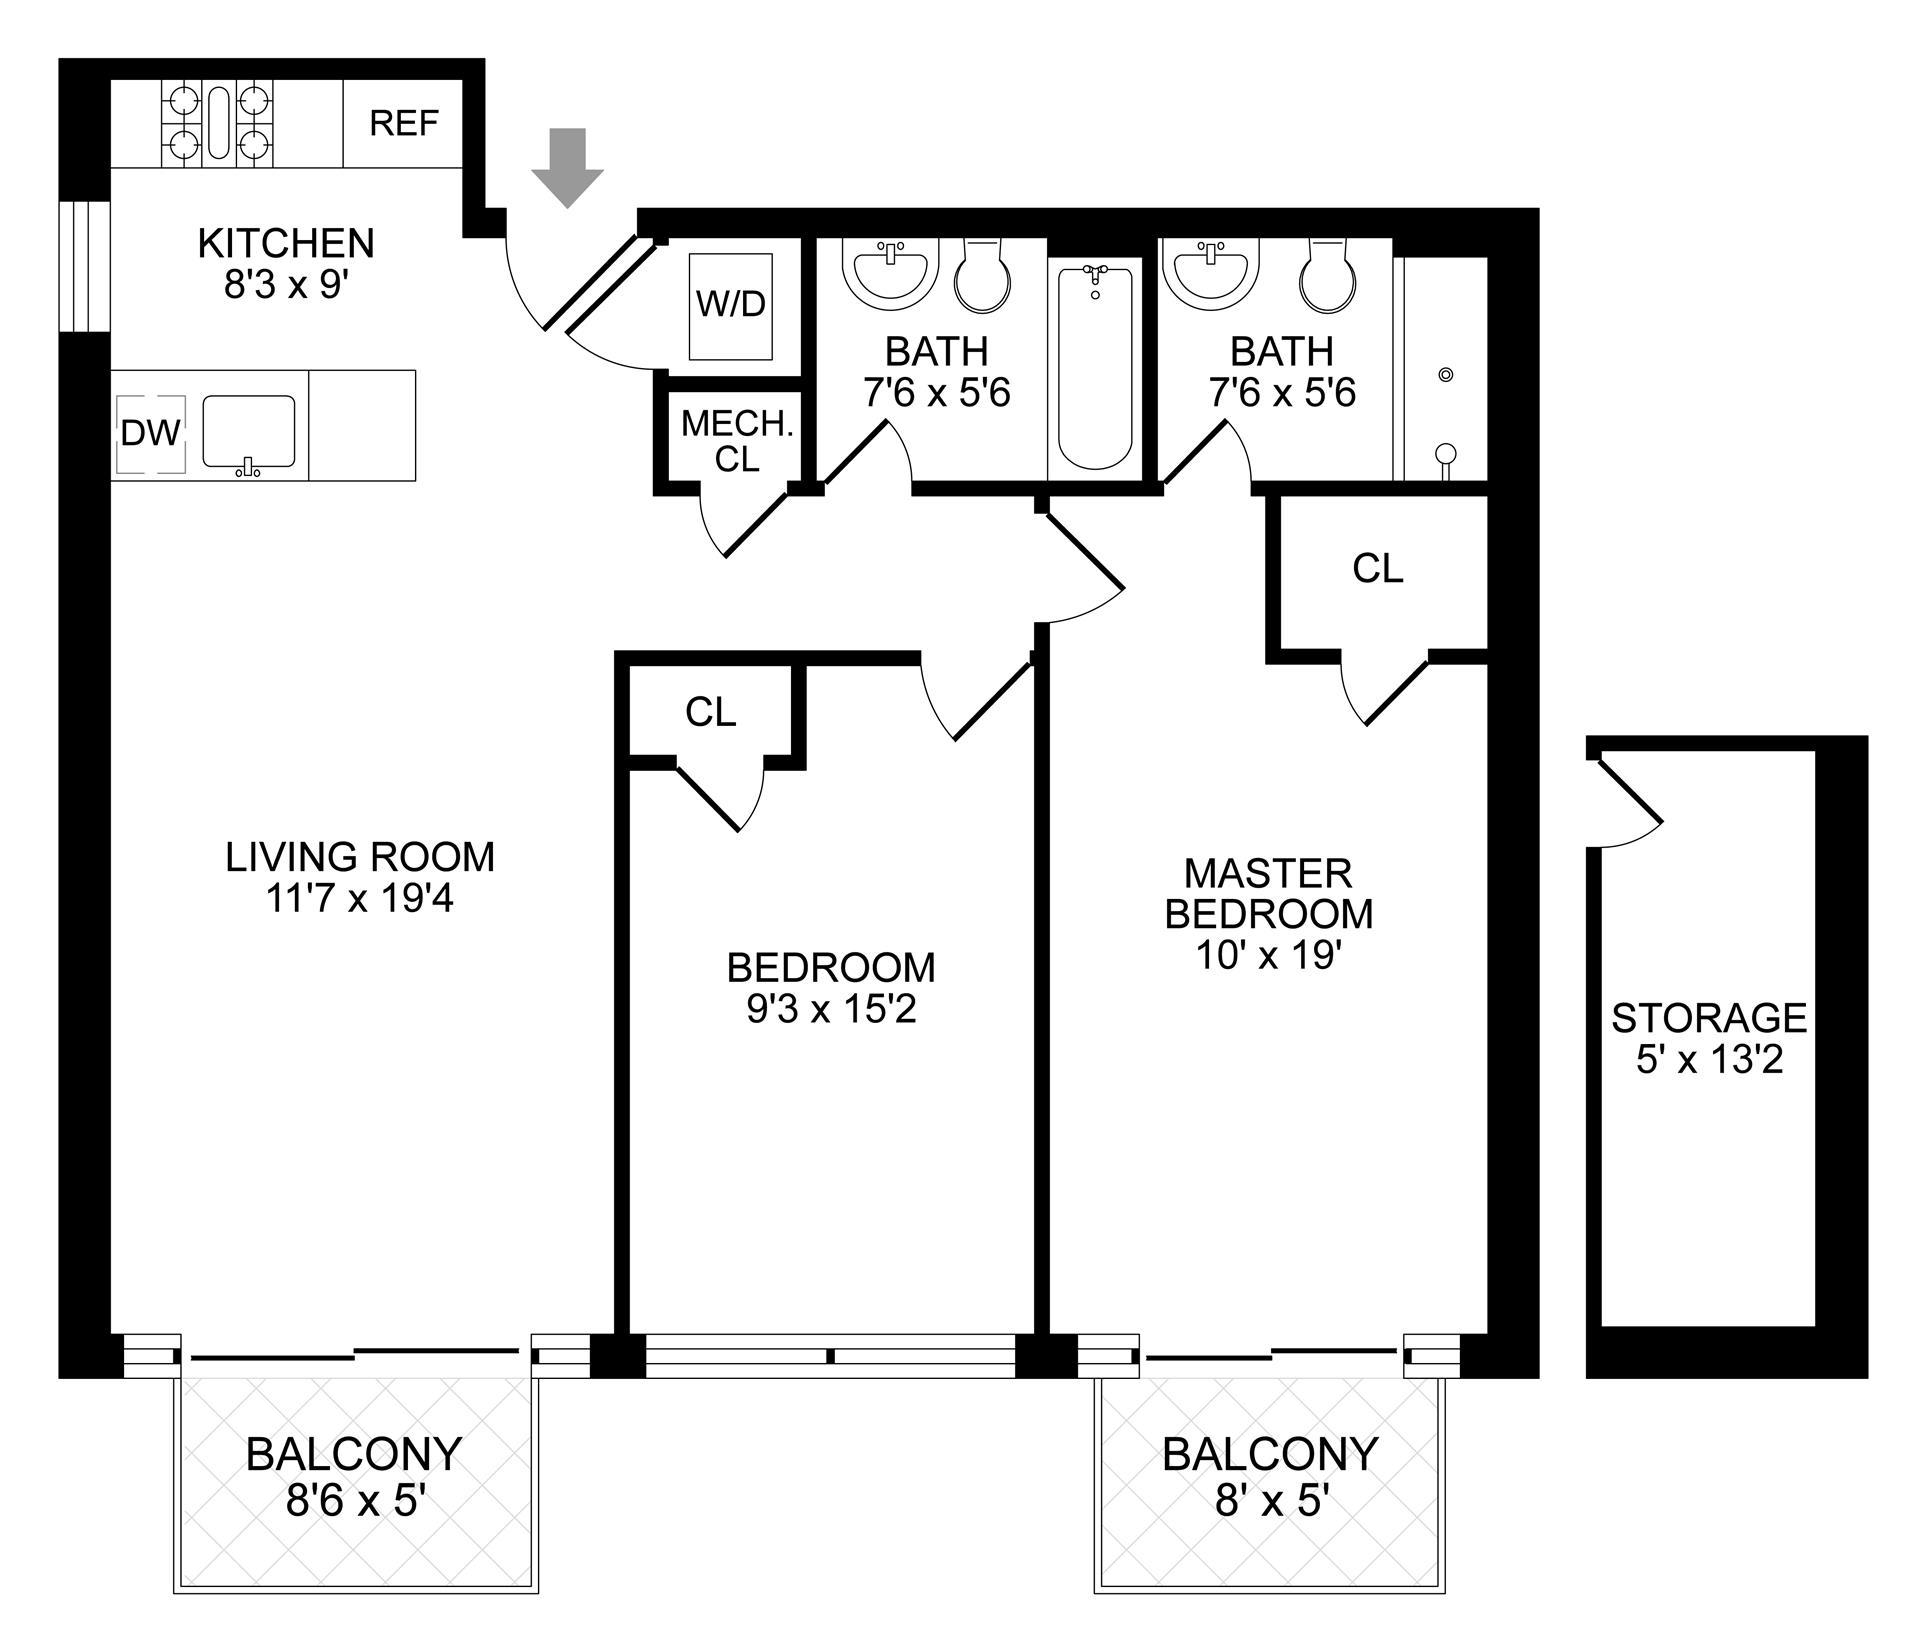 Floor plan of 854 Putnam Avenue, 3A - Stuyvesant Heights, New York